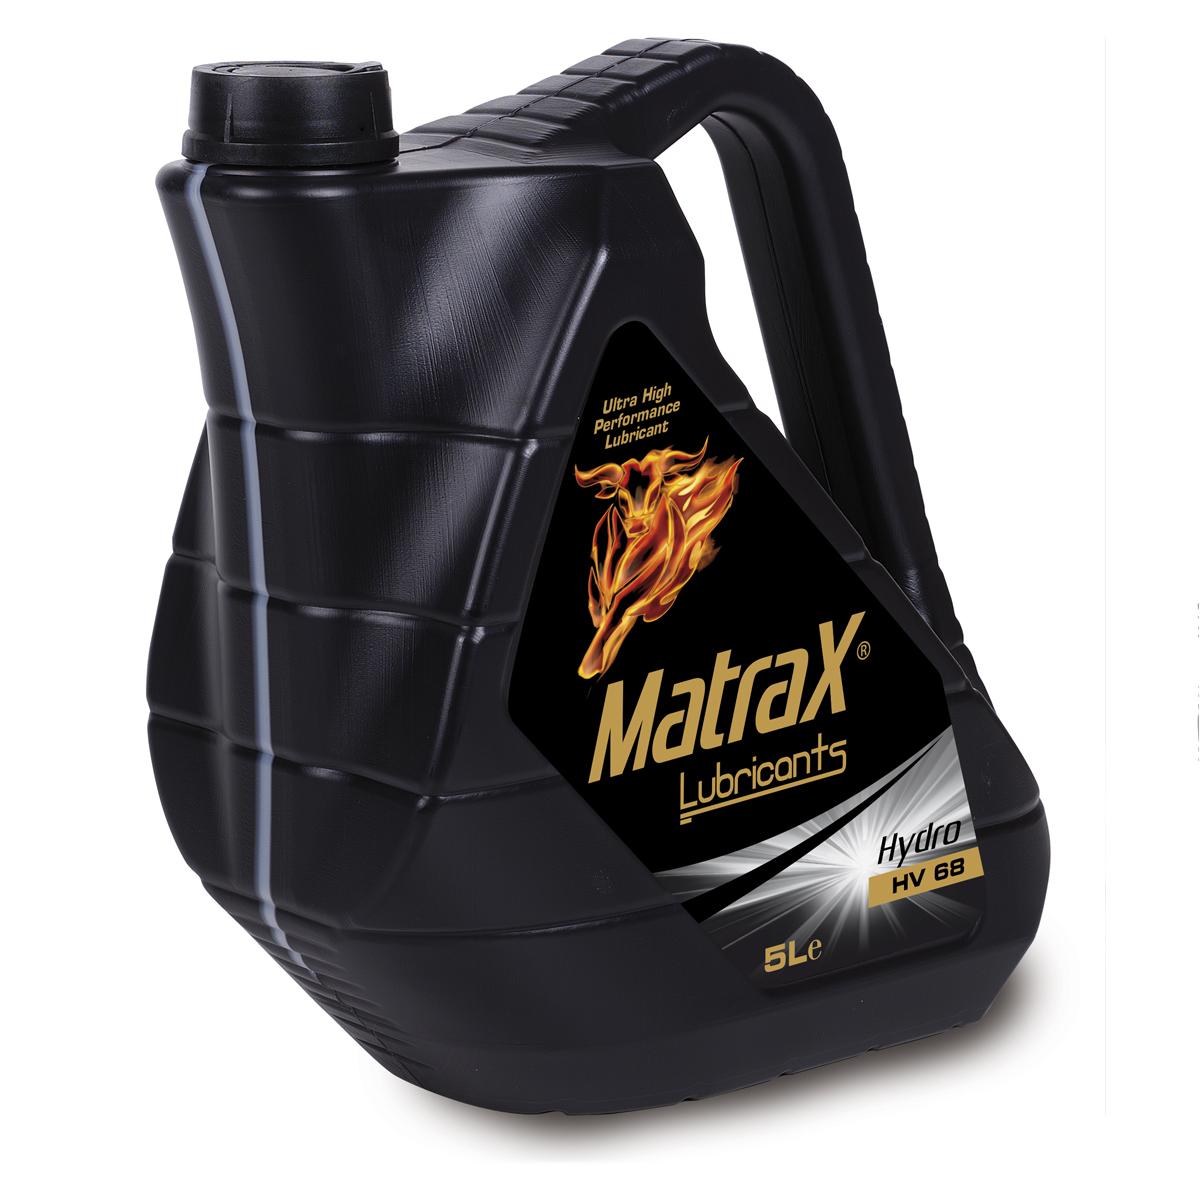 MatraX Hydro HV 68